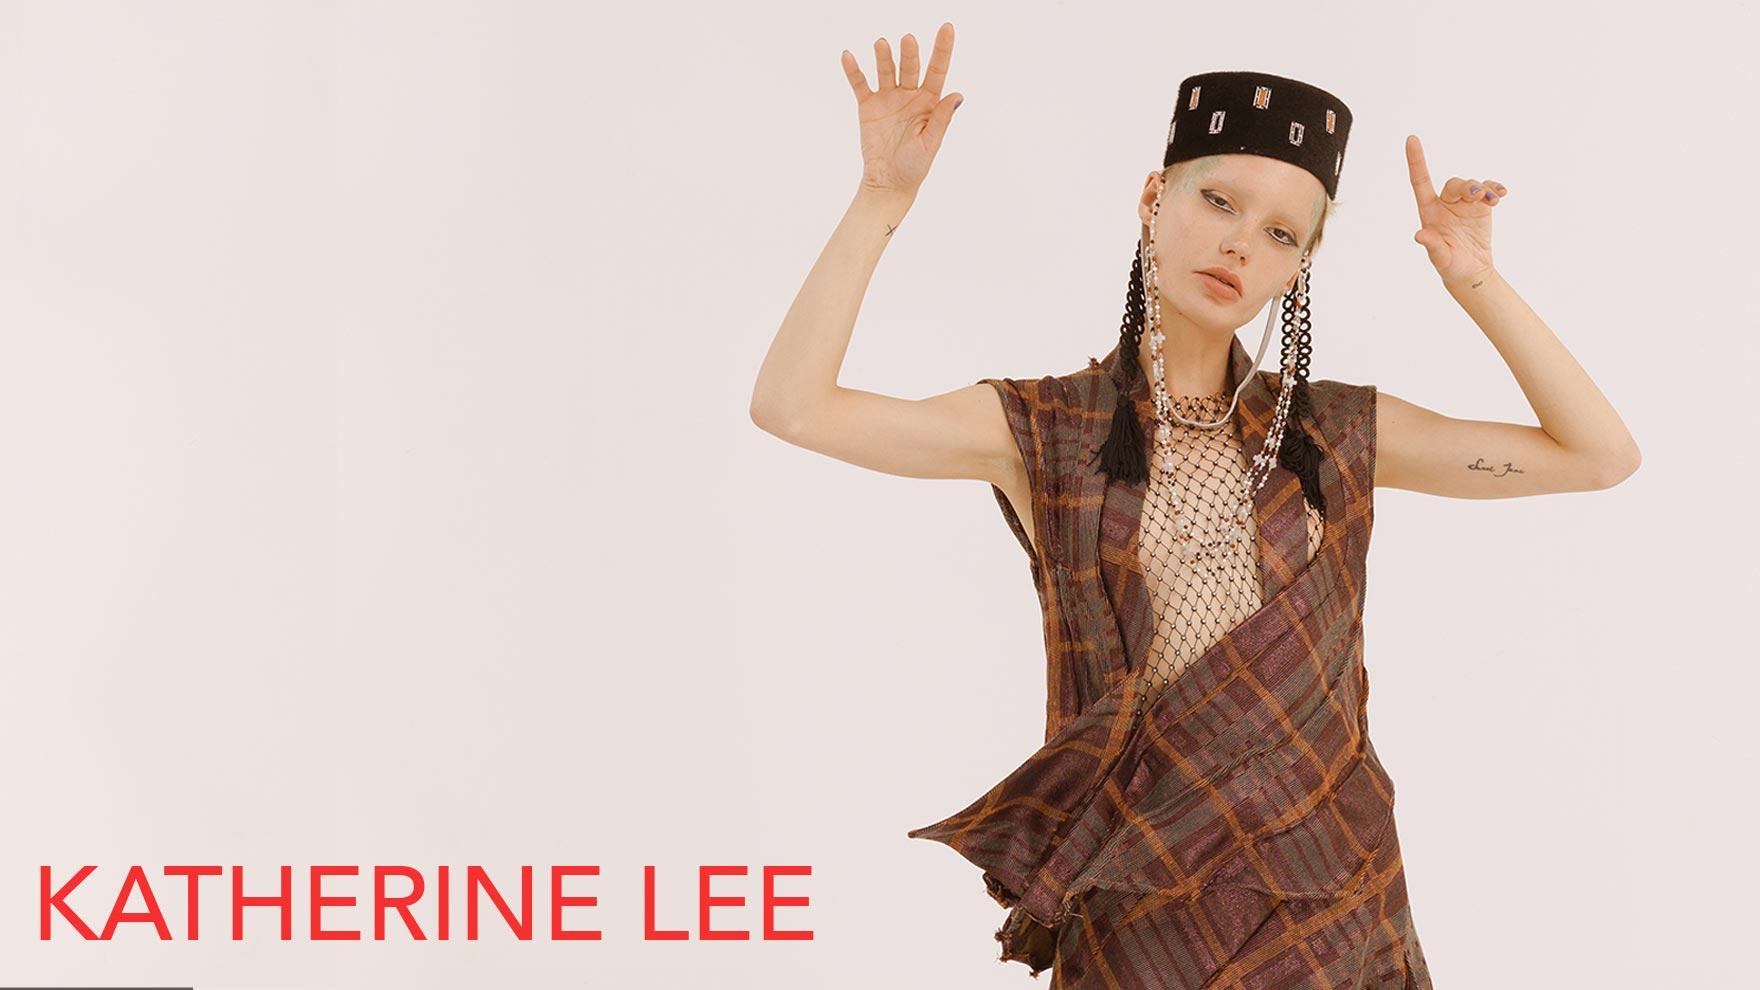 Katherine Lee London College Of Fashion 2019